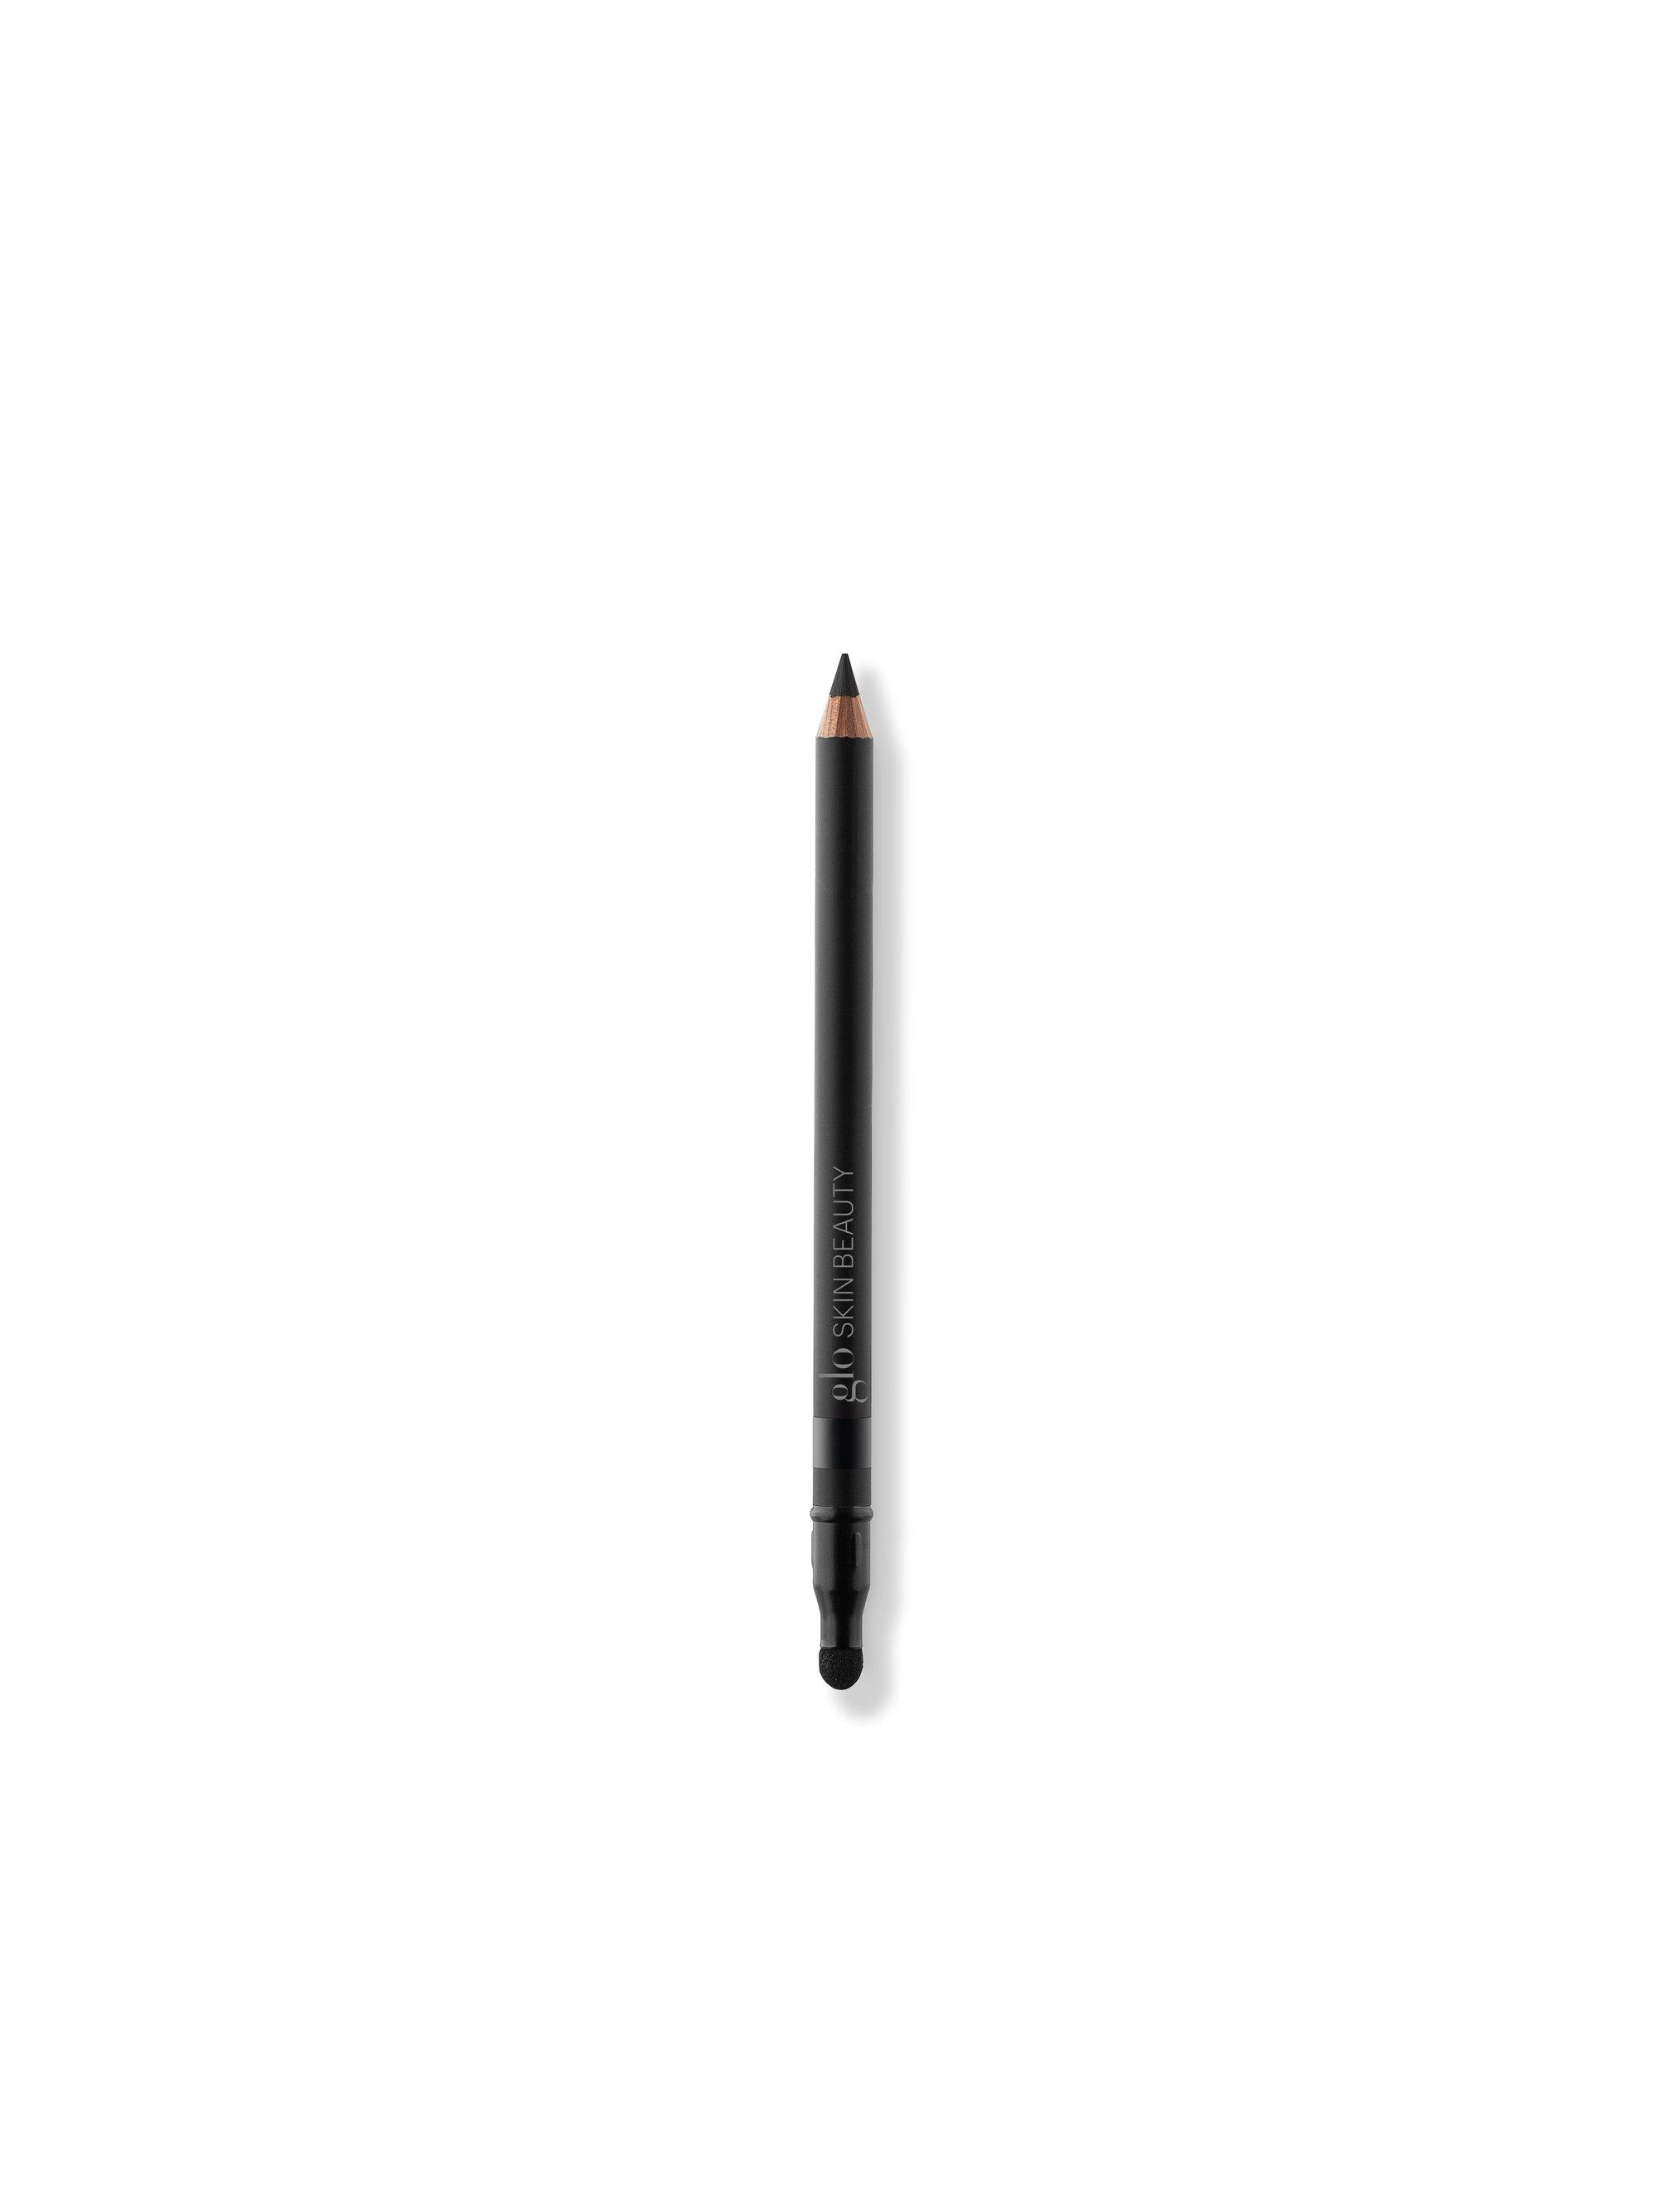 Image of Precision Eye Pencil